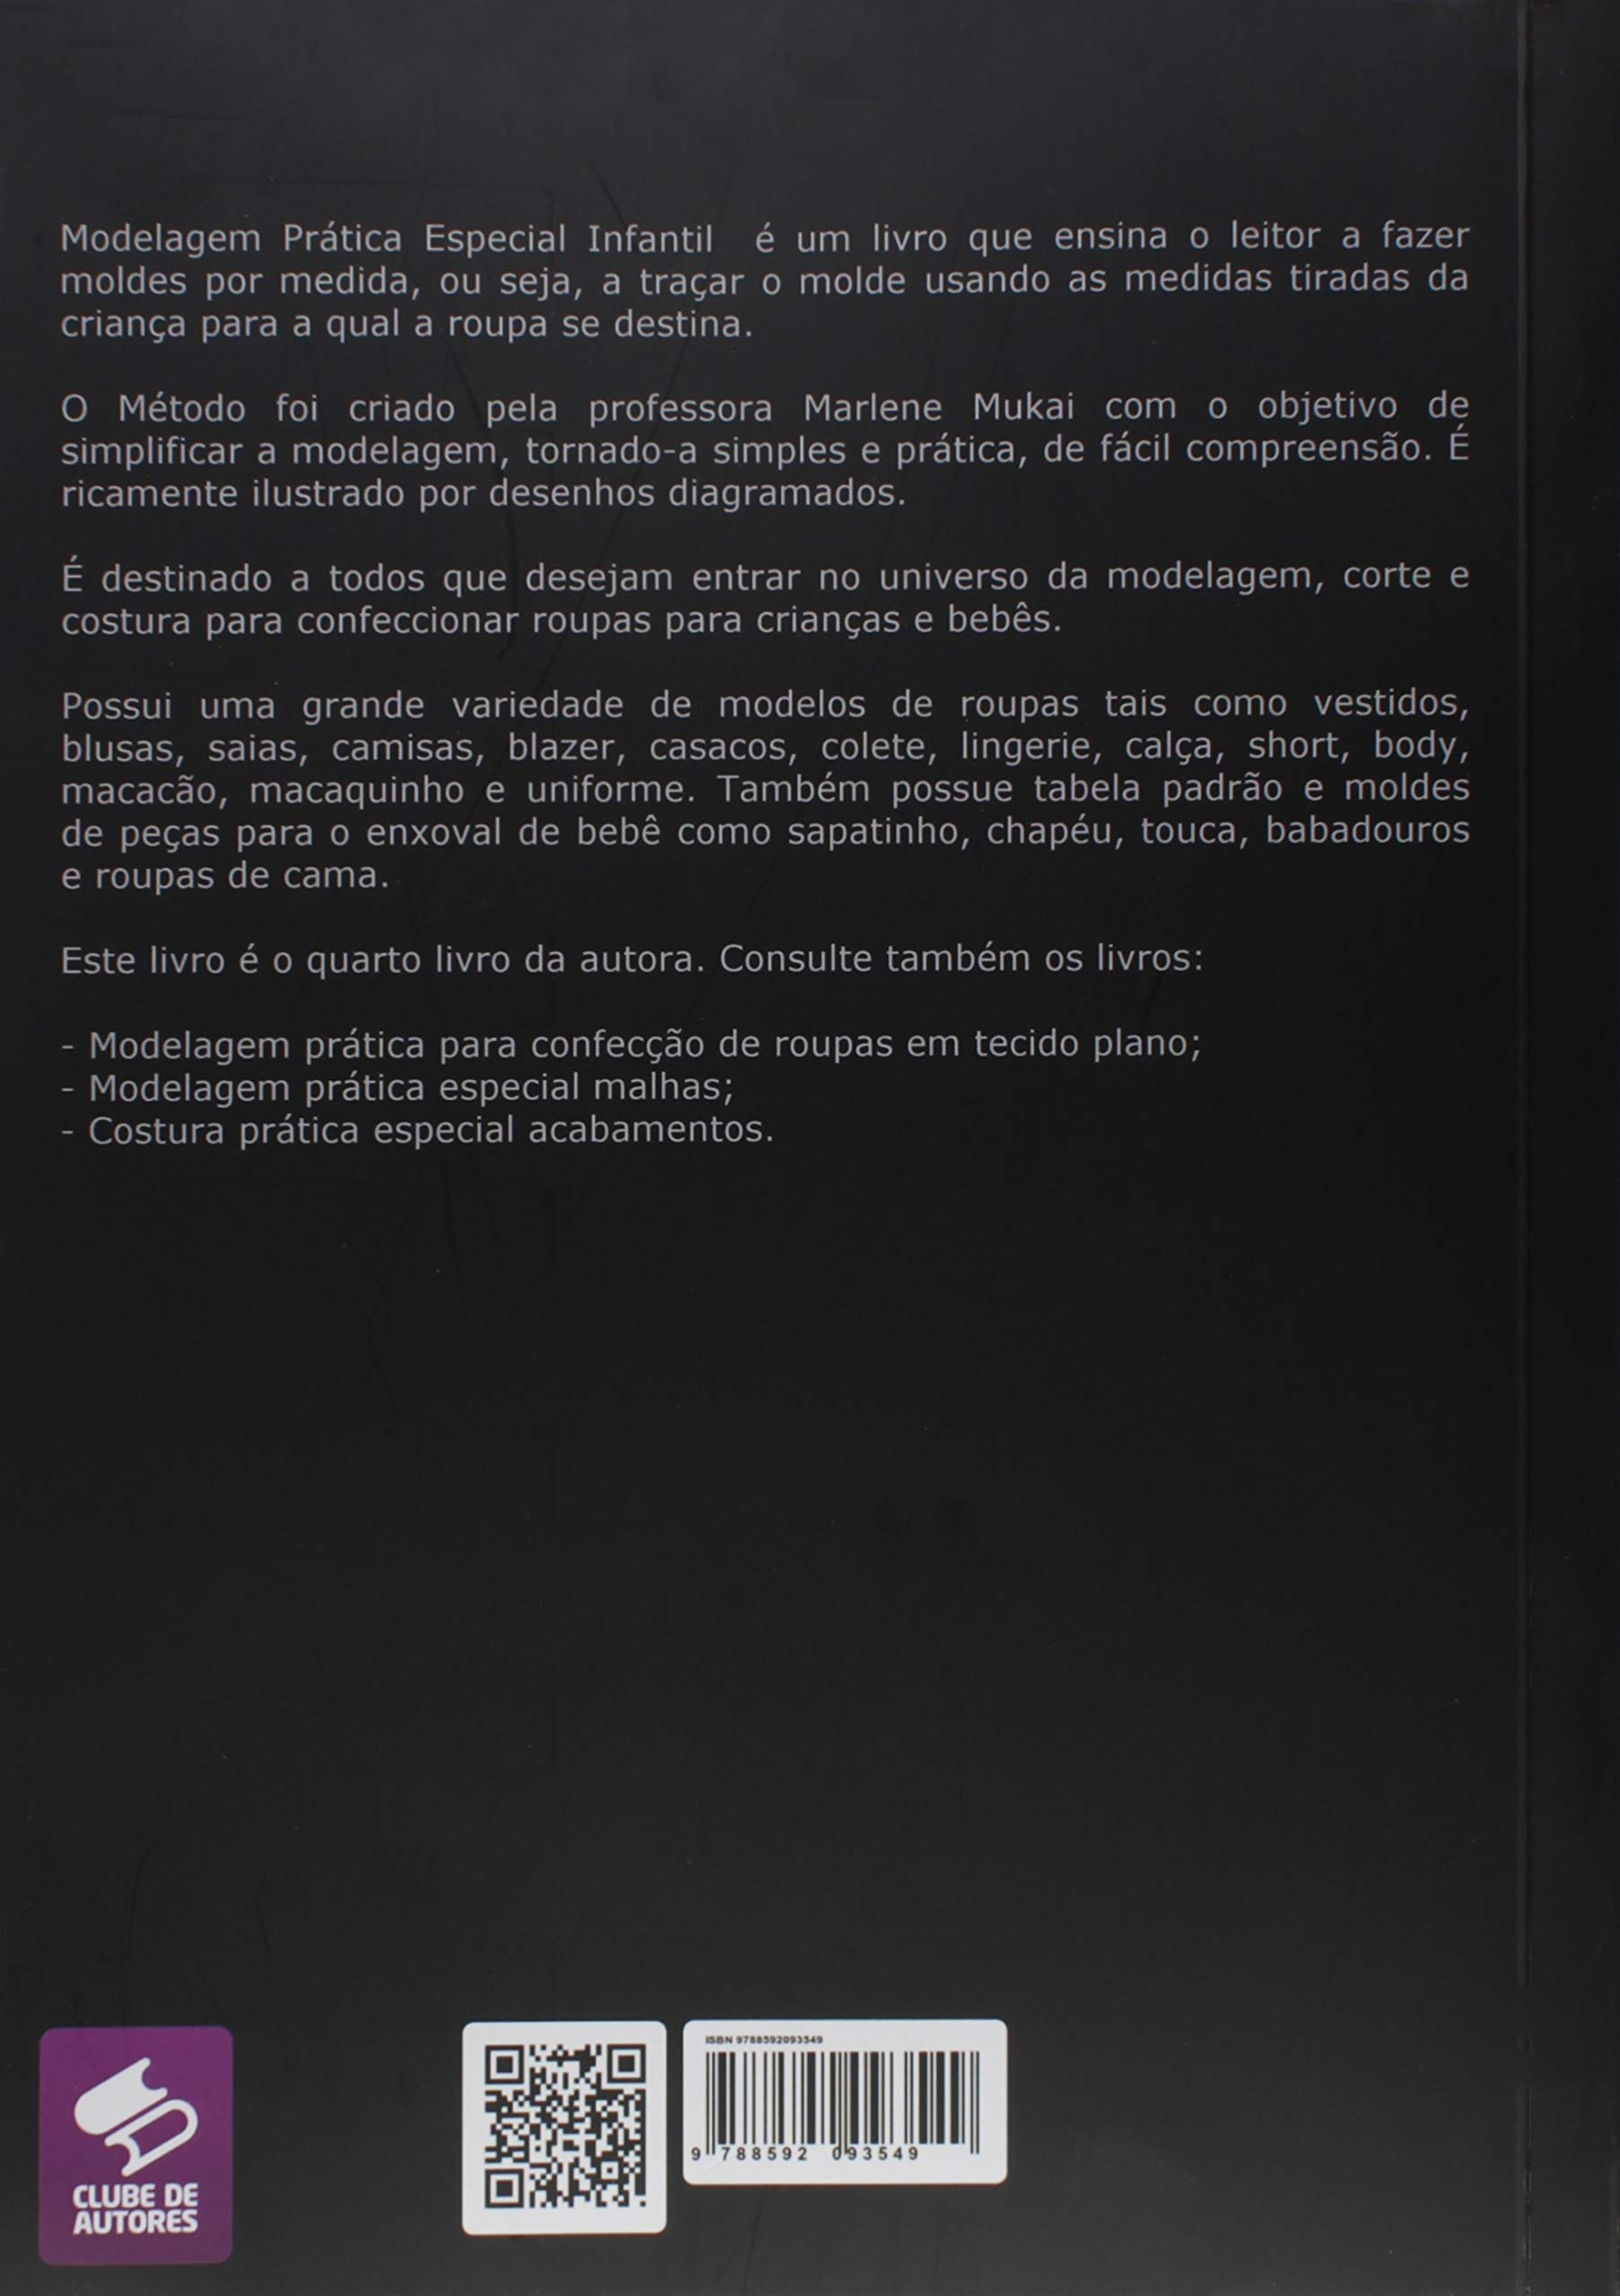 Modelagem Pratica Especial Infantil (Portuguese Edition): Marlene mukai: 9788592093549: Amazon.com: Books